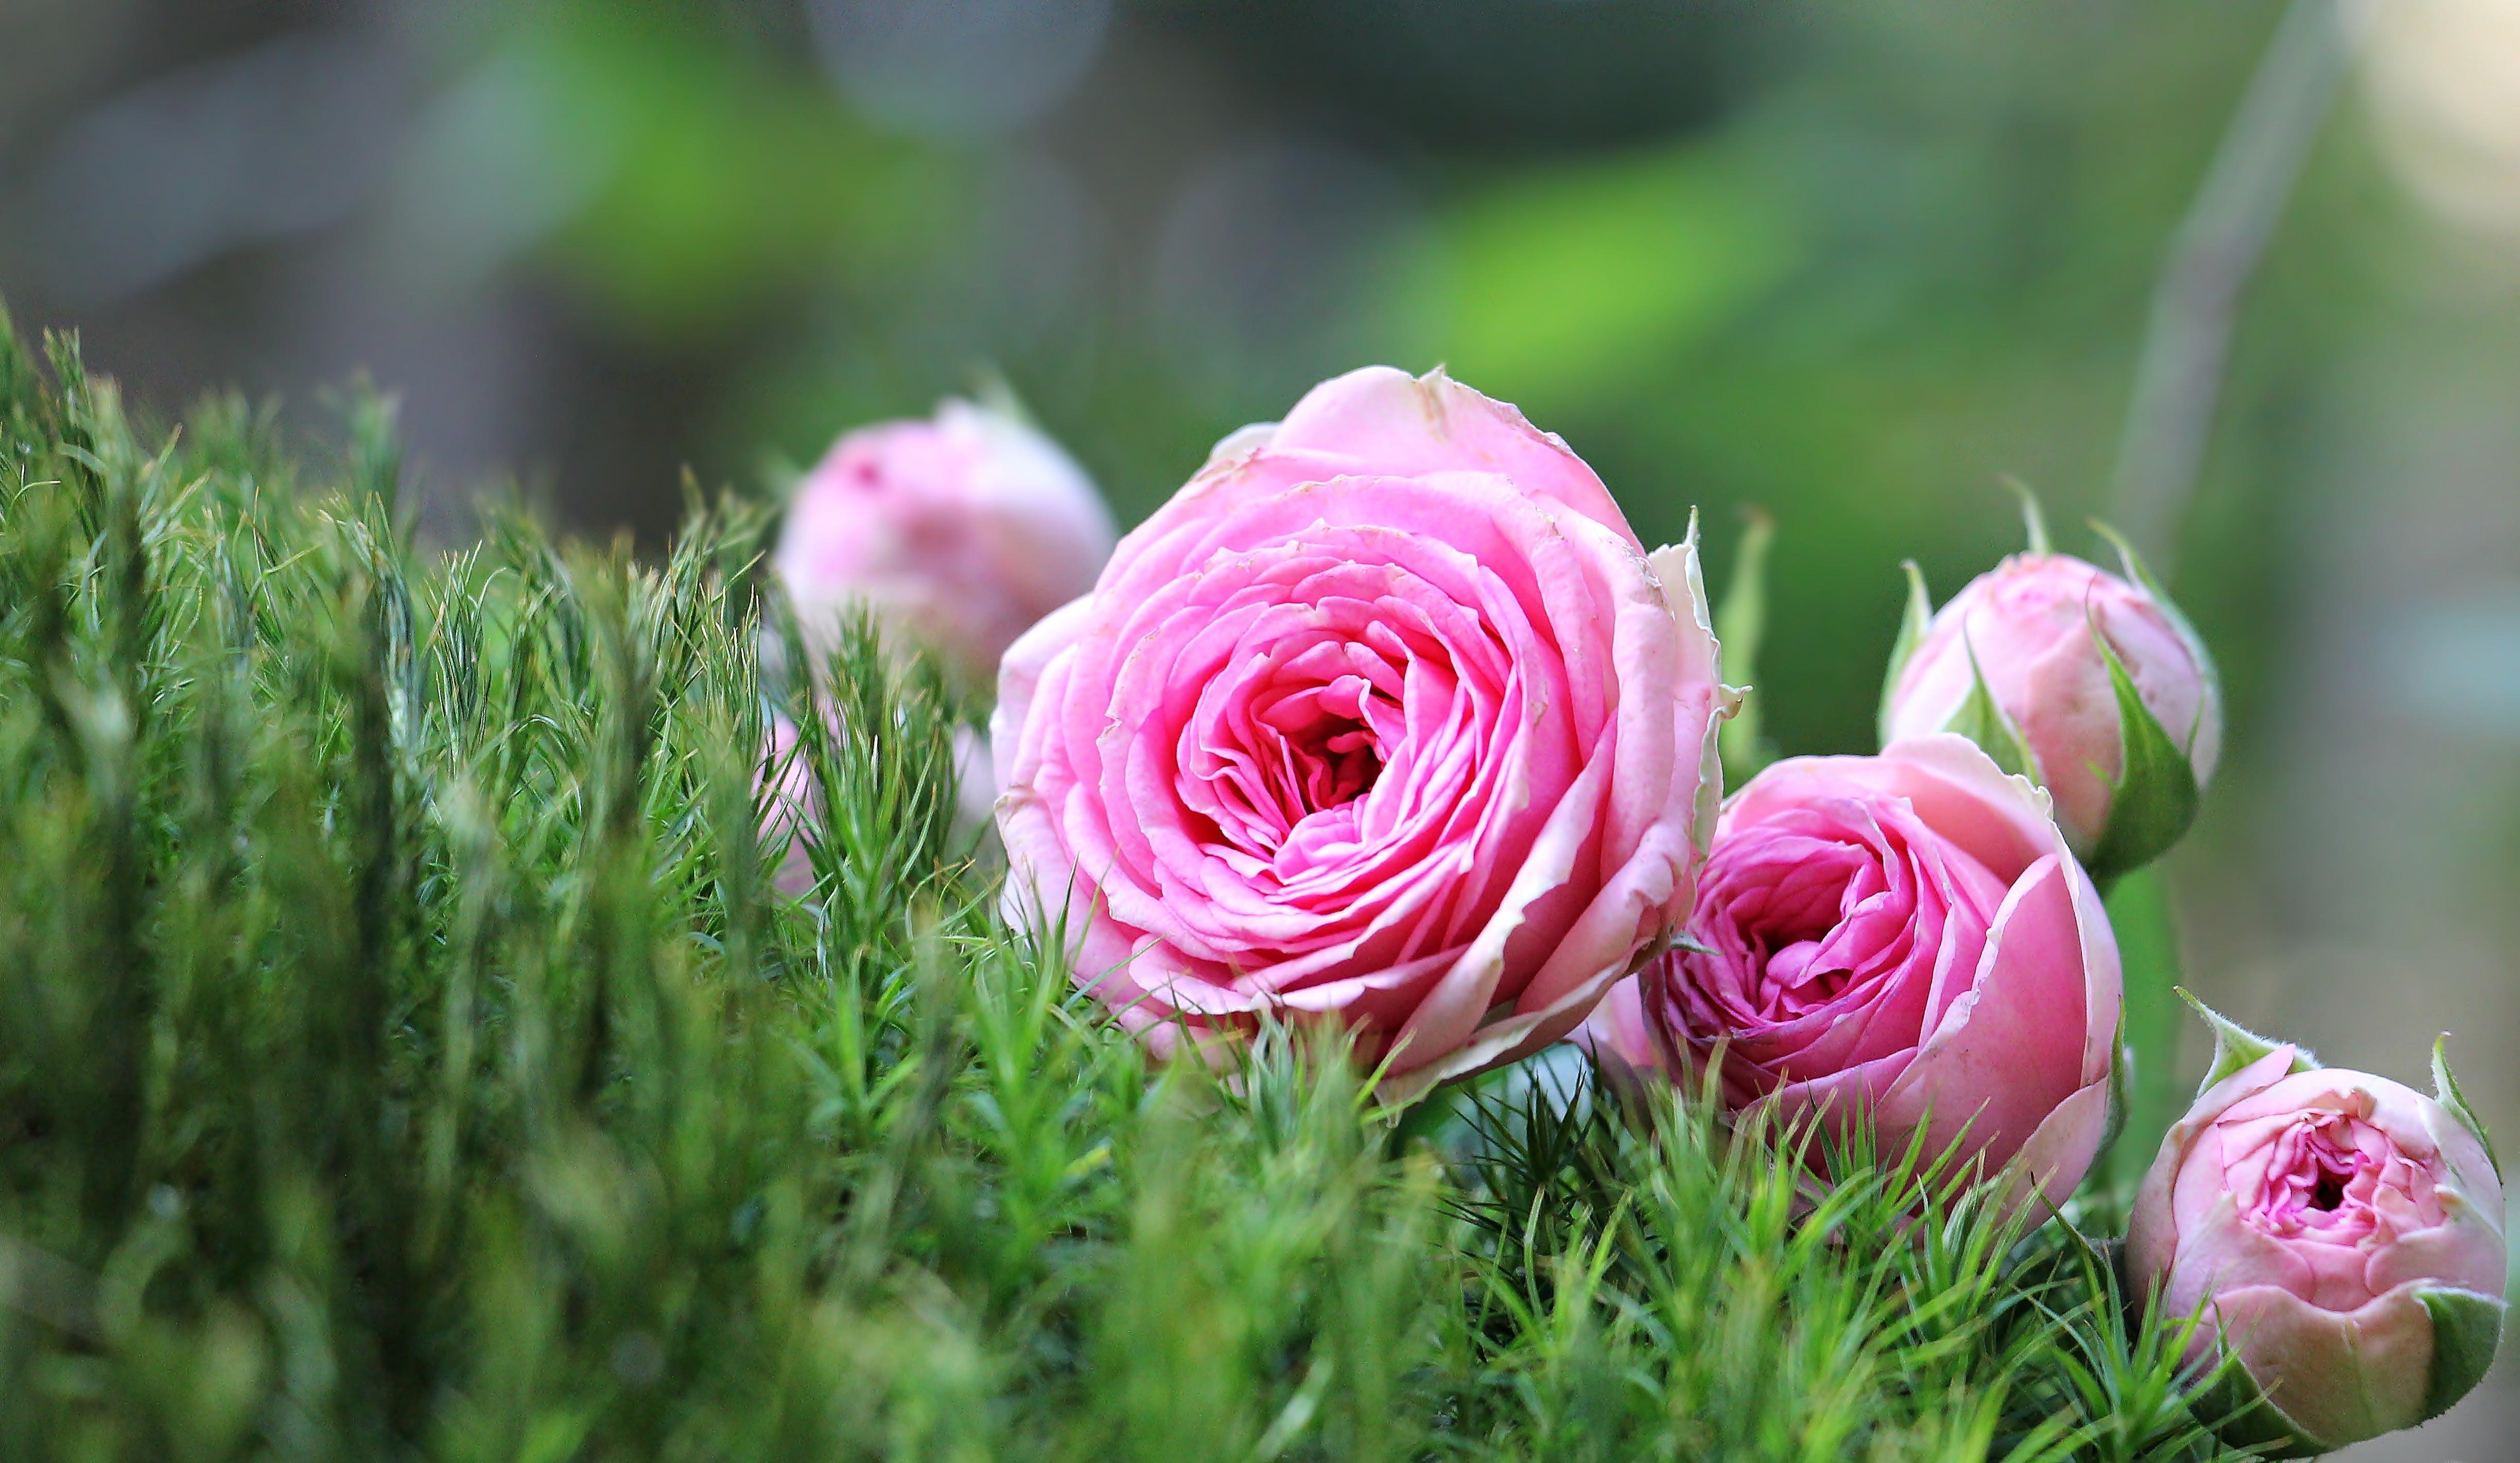 Macro Photo of Pink Roses